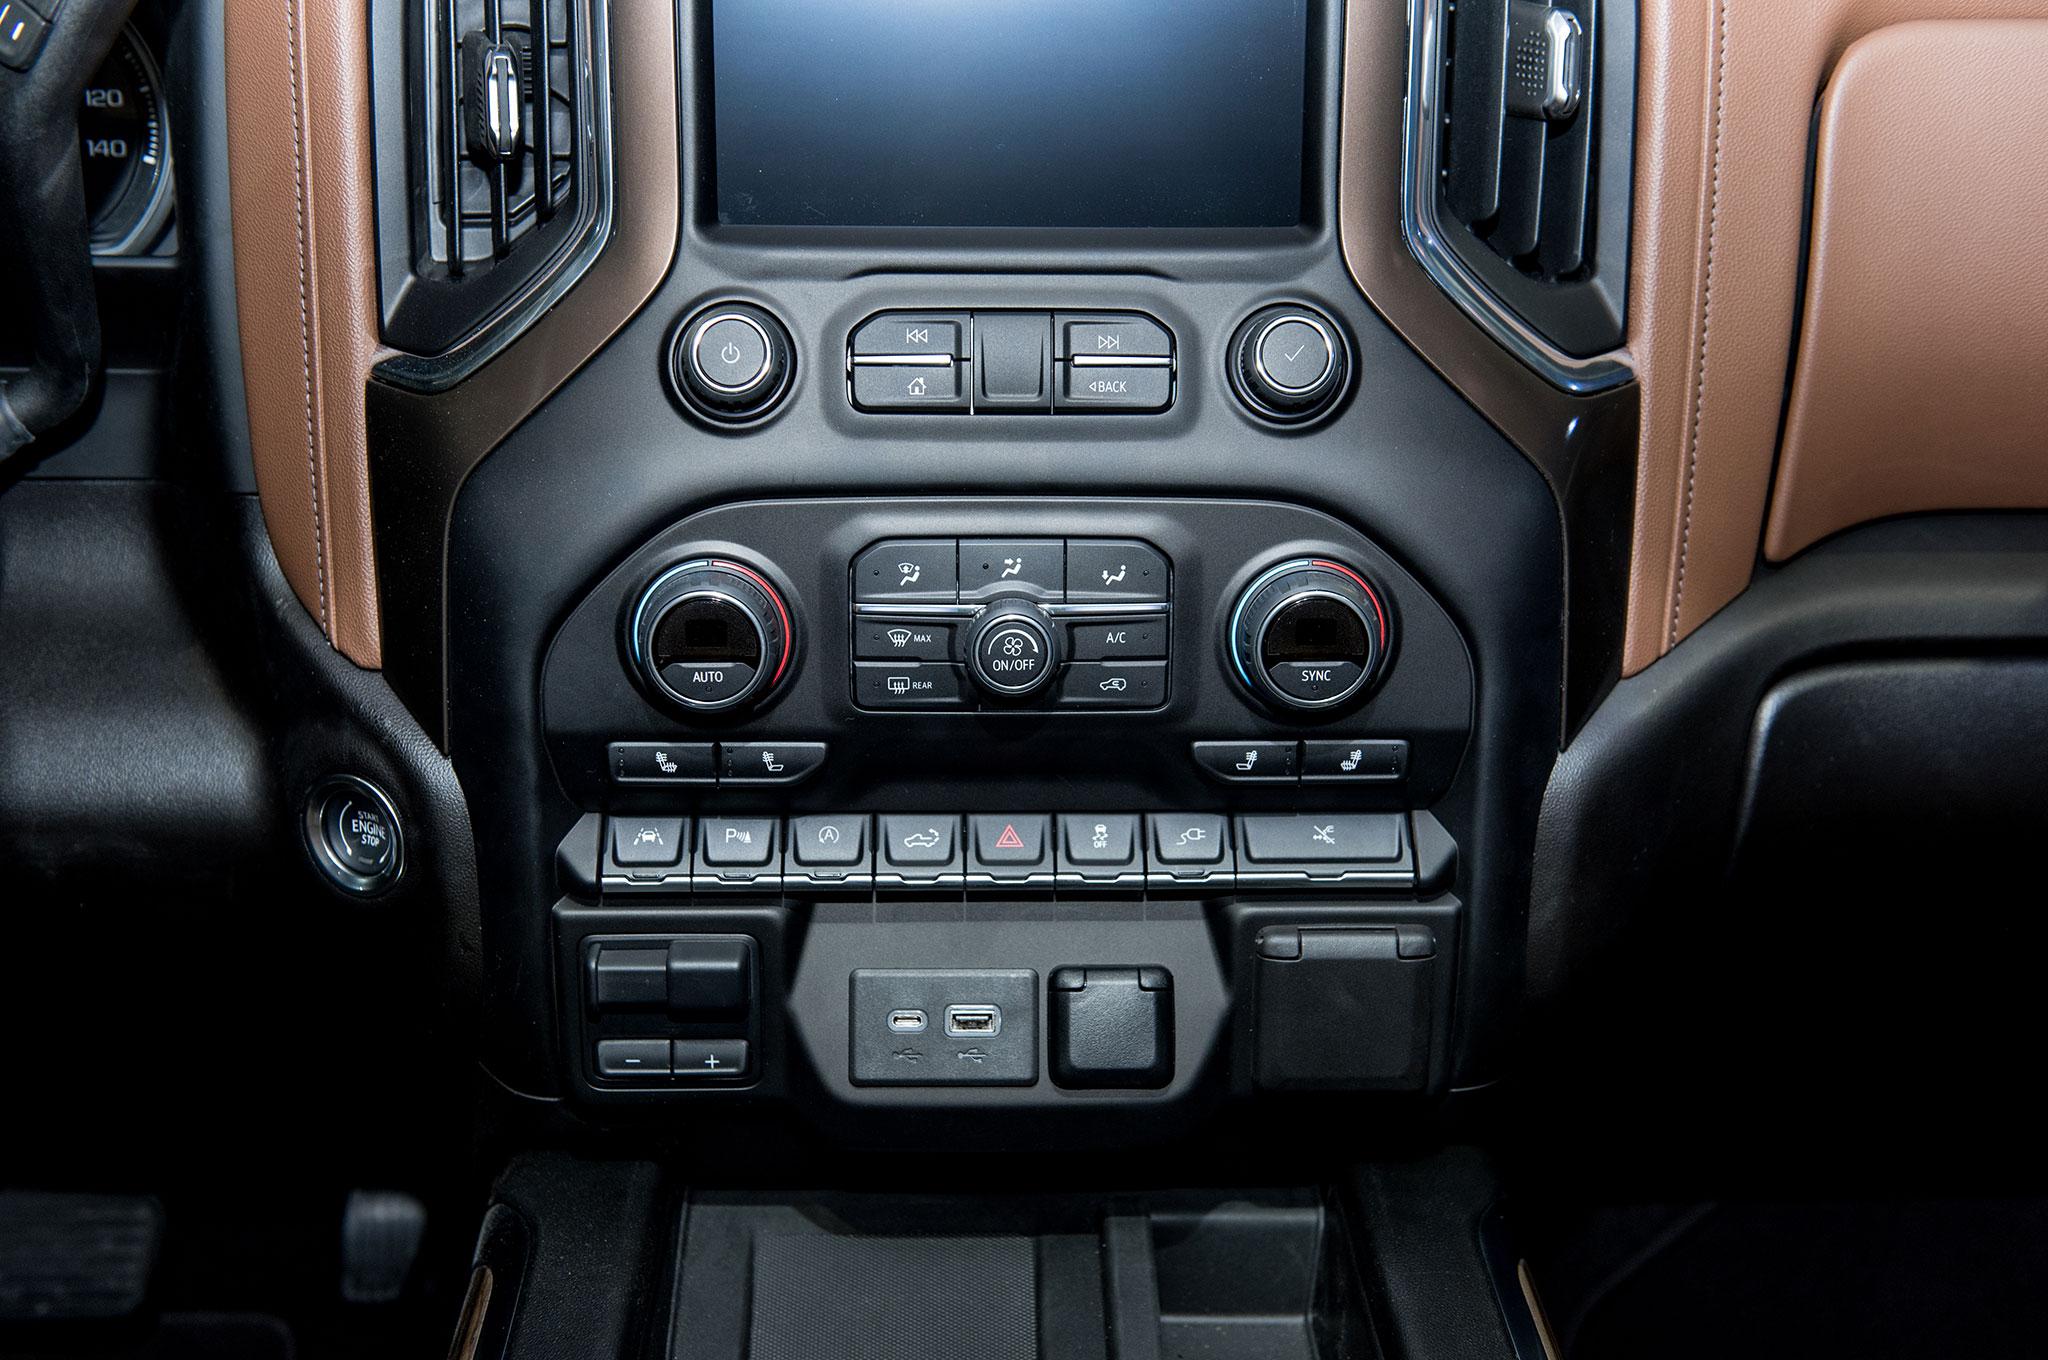 2019 Chevrolet Silverado 1500 High Country Interior Center Stack Motor Trend En Espa Ol